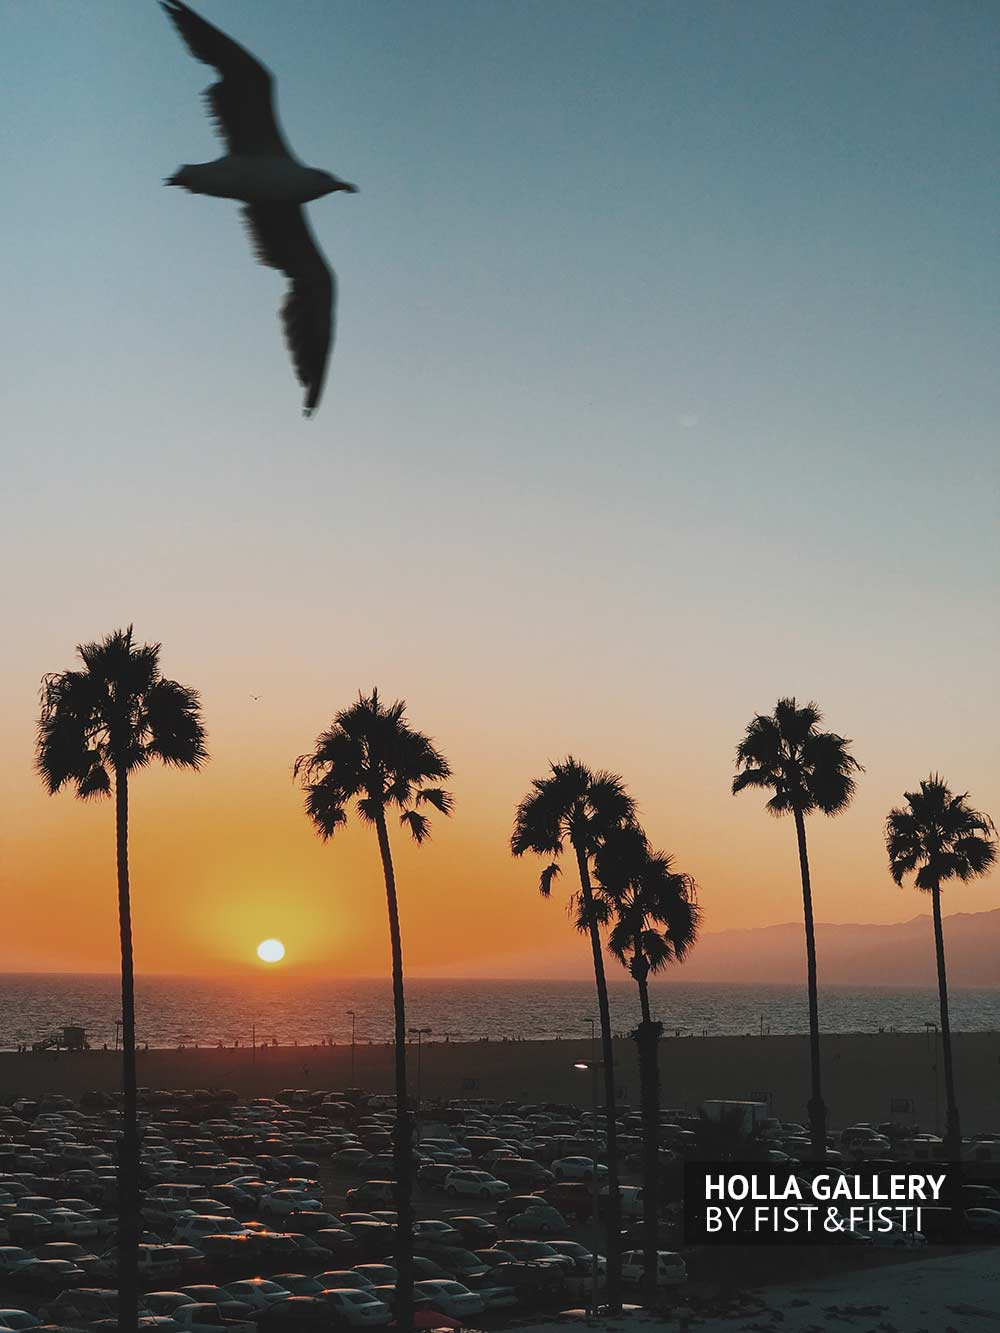 Чайка на фоне пальм и заката на Santa Monica beach